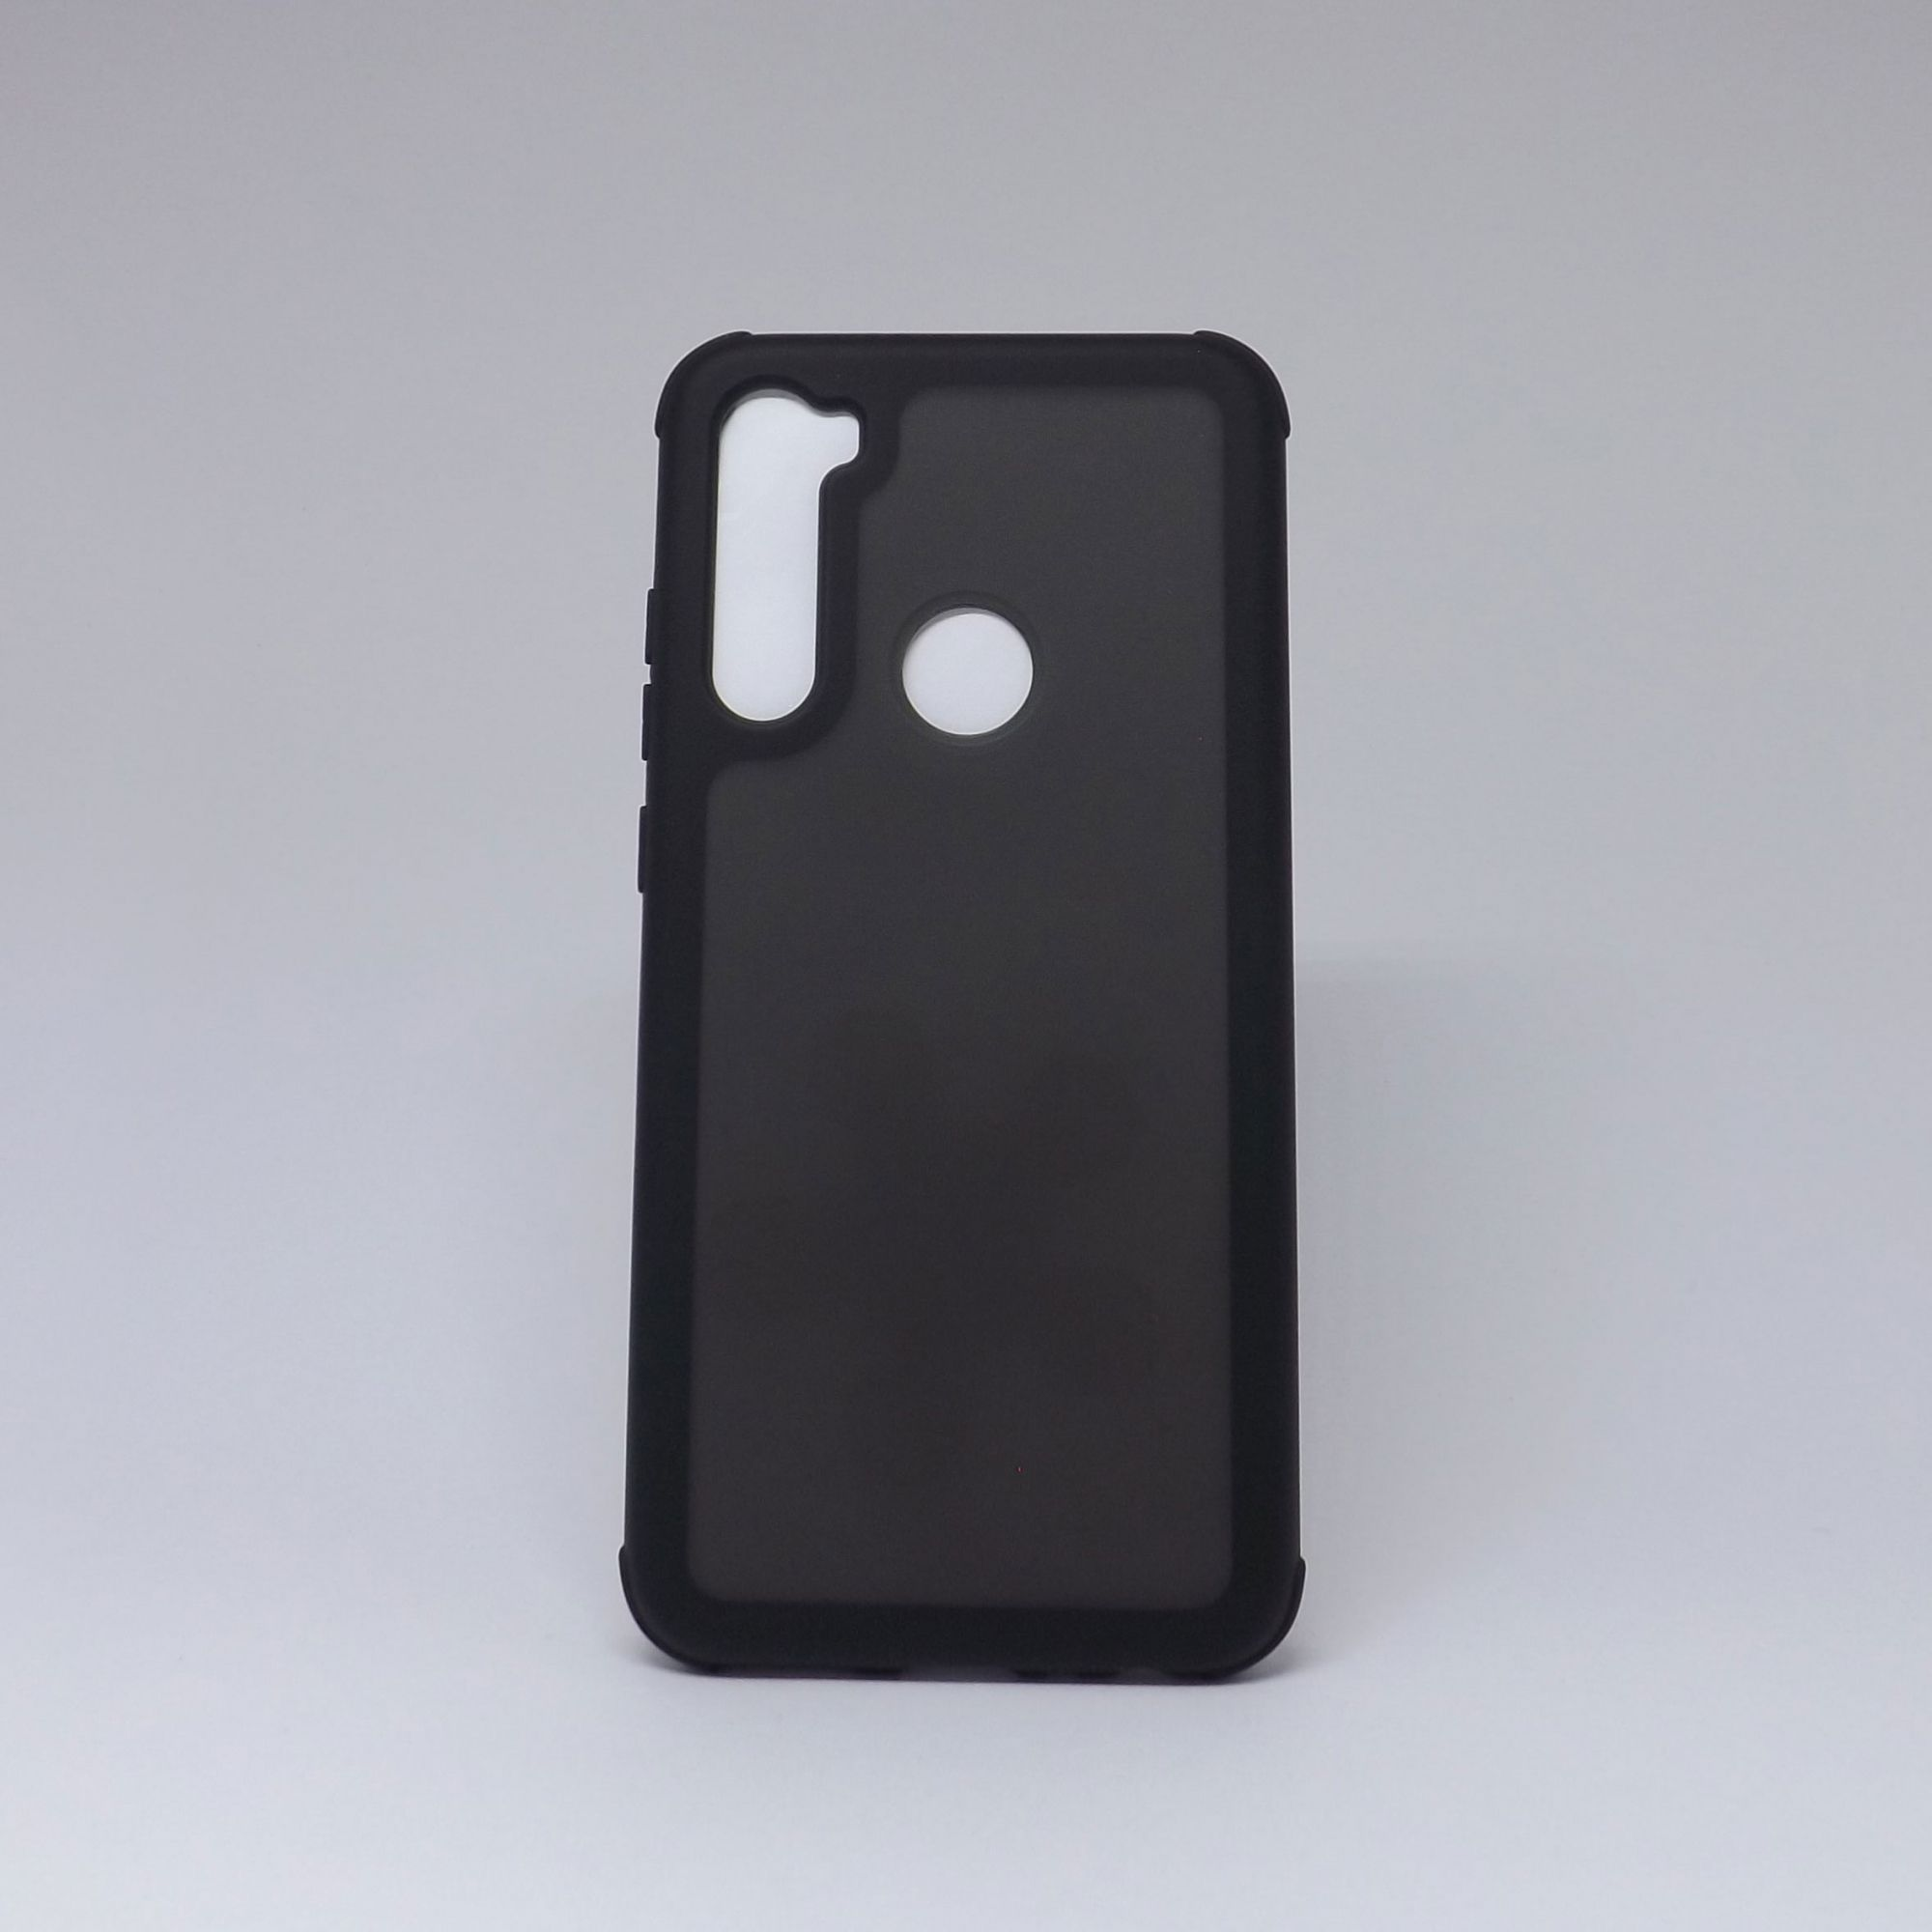 Capa Xiaomi Redmi Note 8 Fumê com Borda Colorida